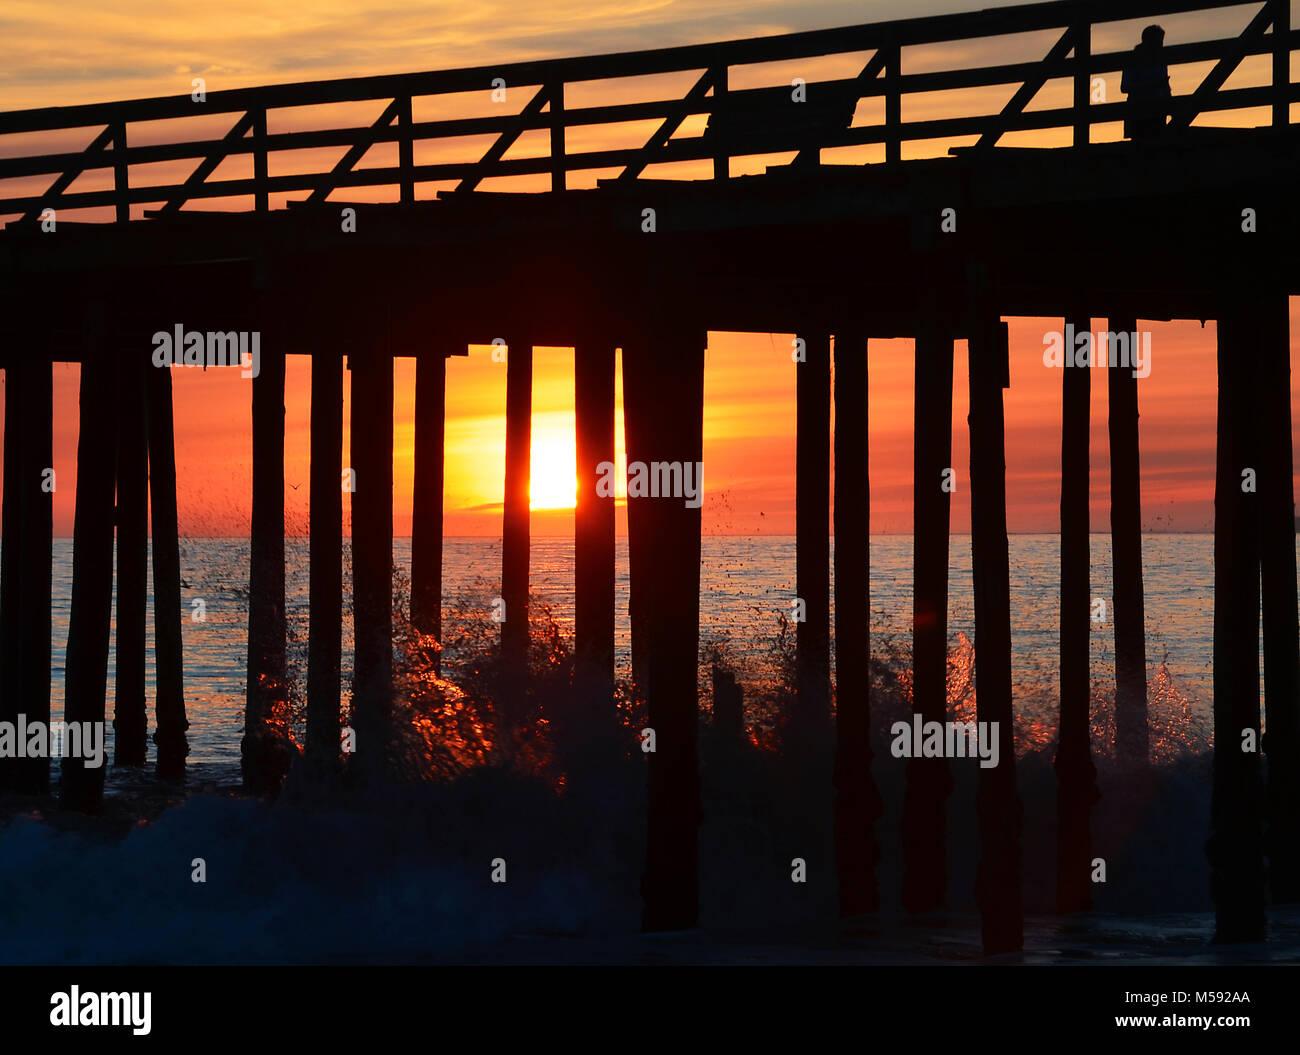 Sunset at Seacliff Beach in Aptos, California - Stock Image